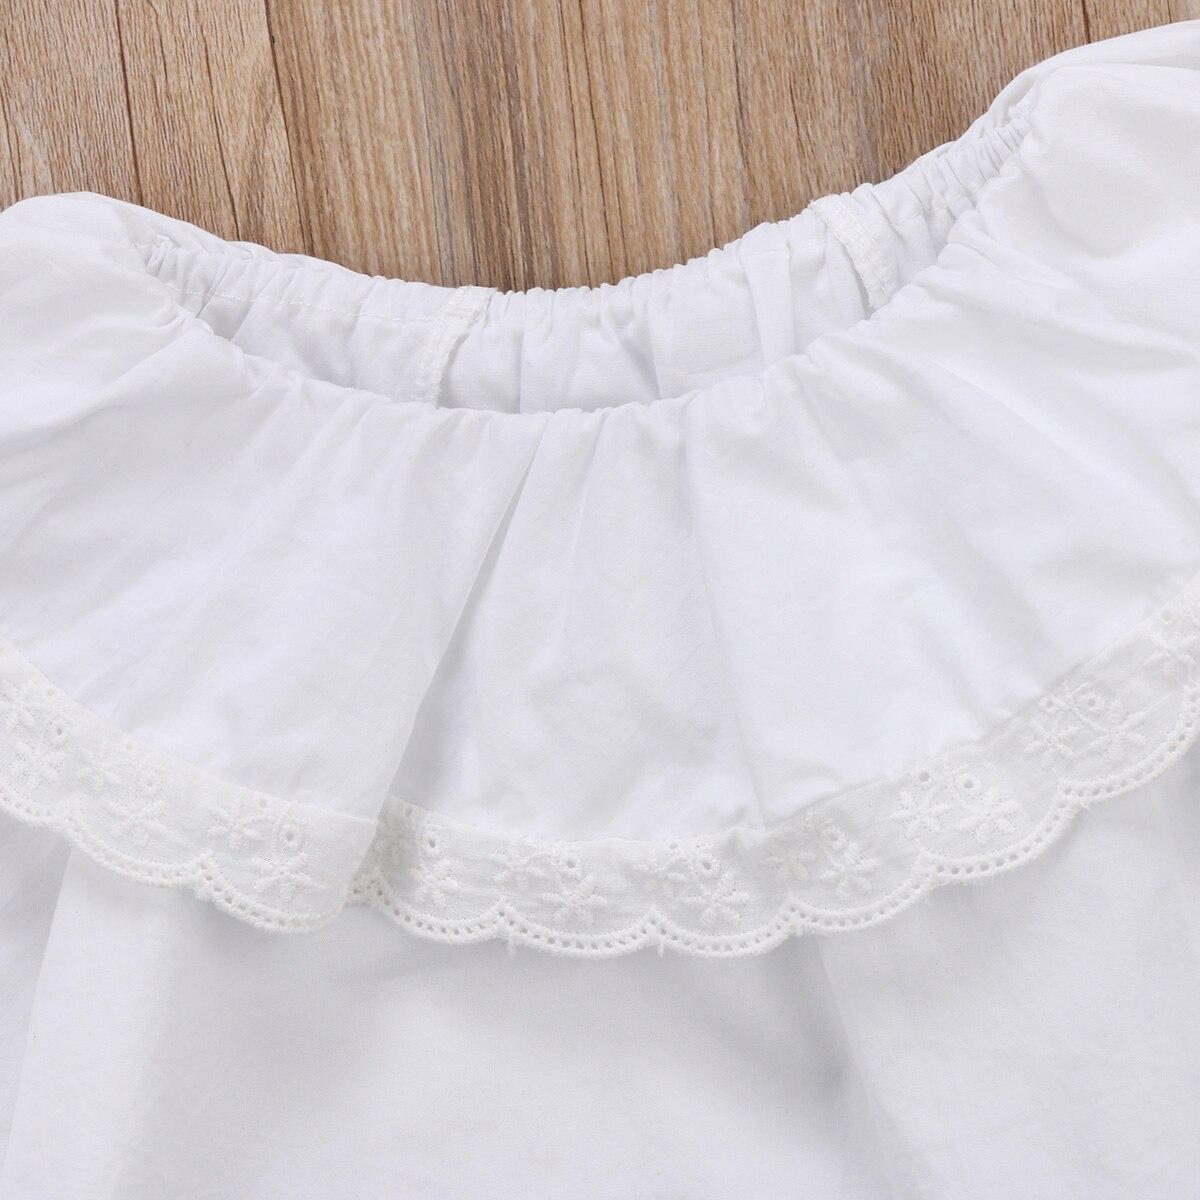 ef485452057a Pretty Newborn Baby Girls Infant Kids Princess Lace Collar Cotton ...